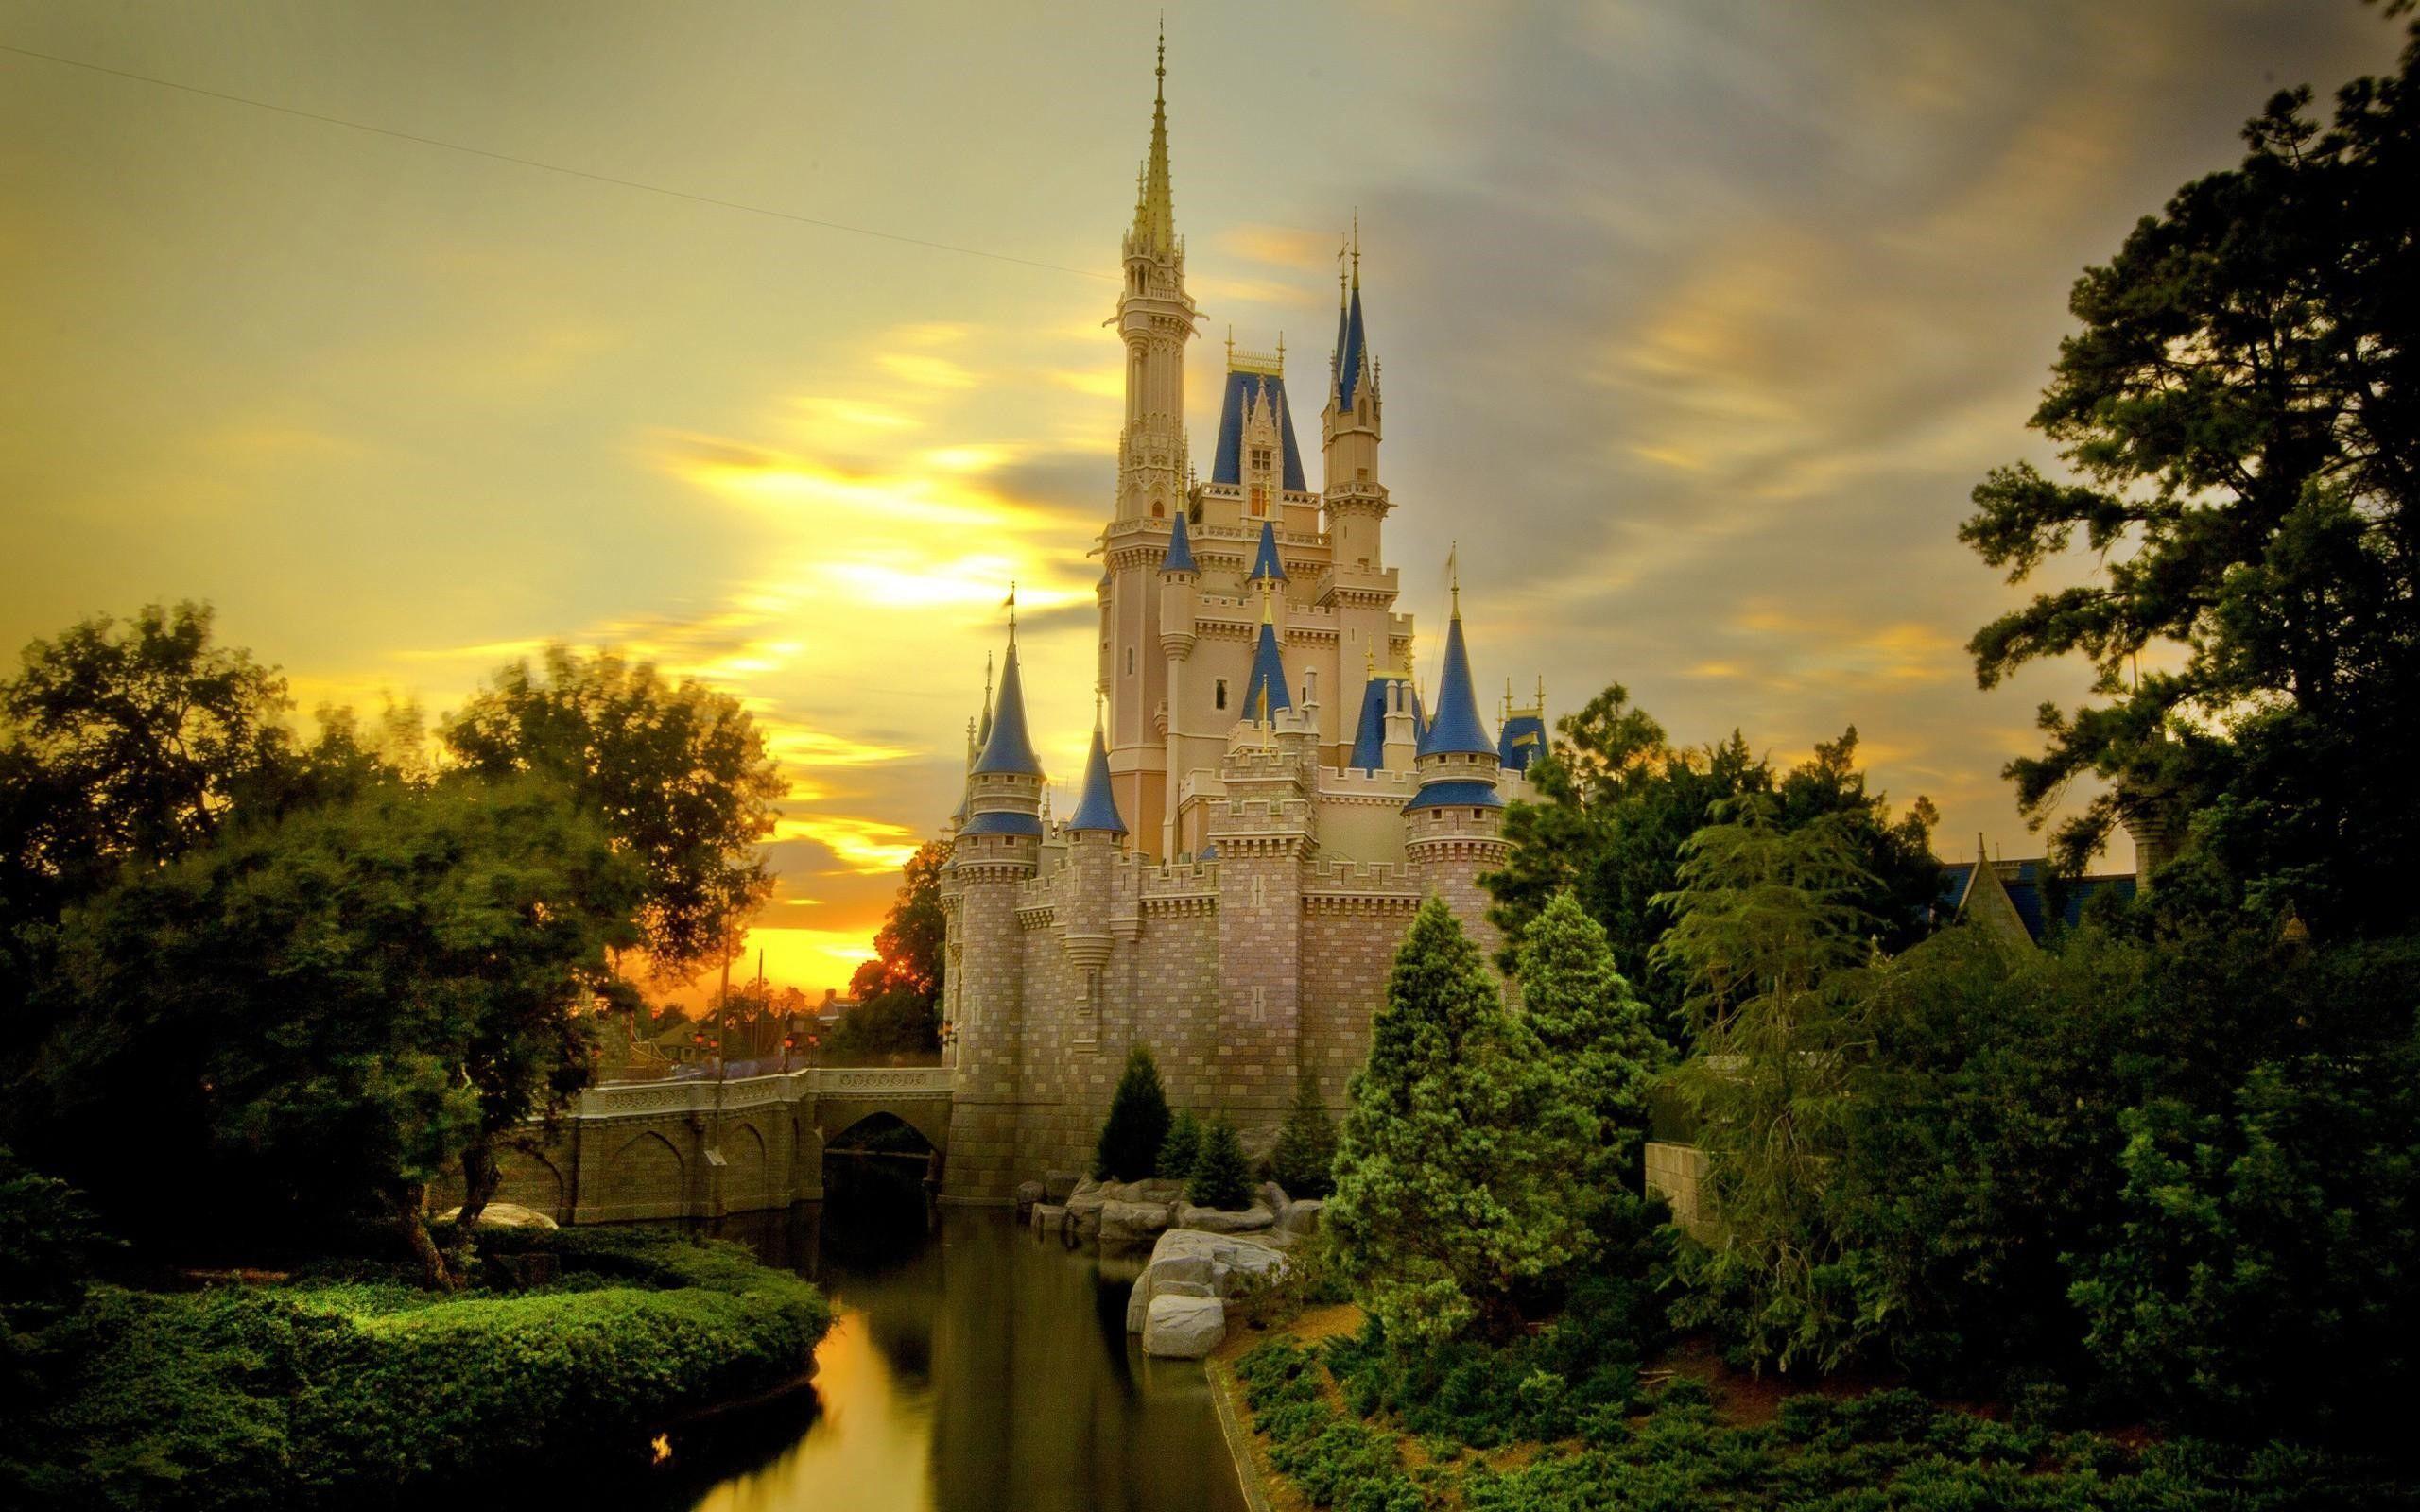 Beautiful Castles Wallpapers Top Free Beautiful Castles